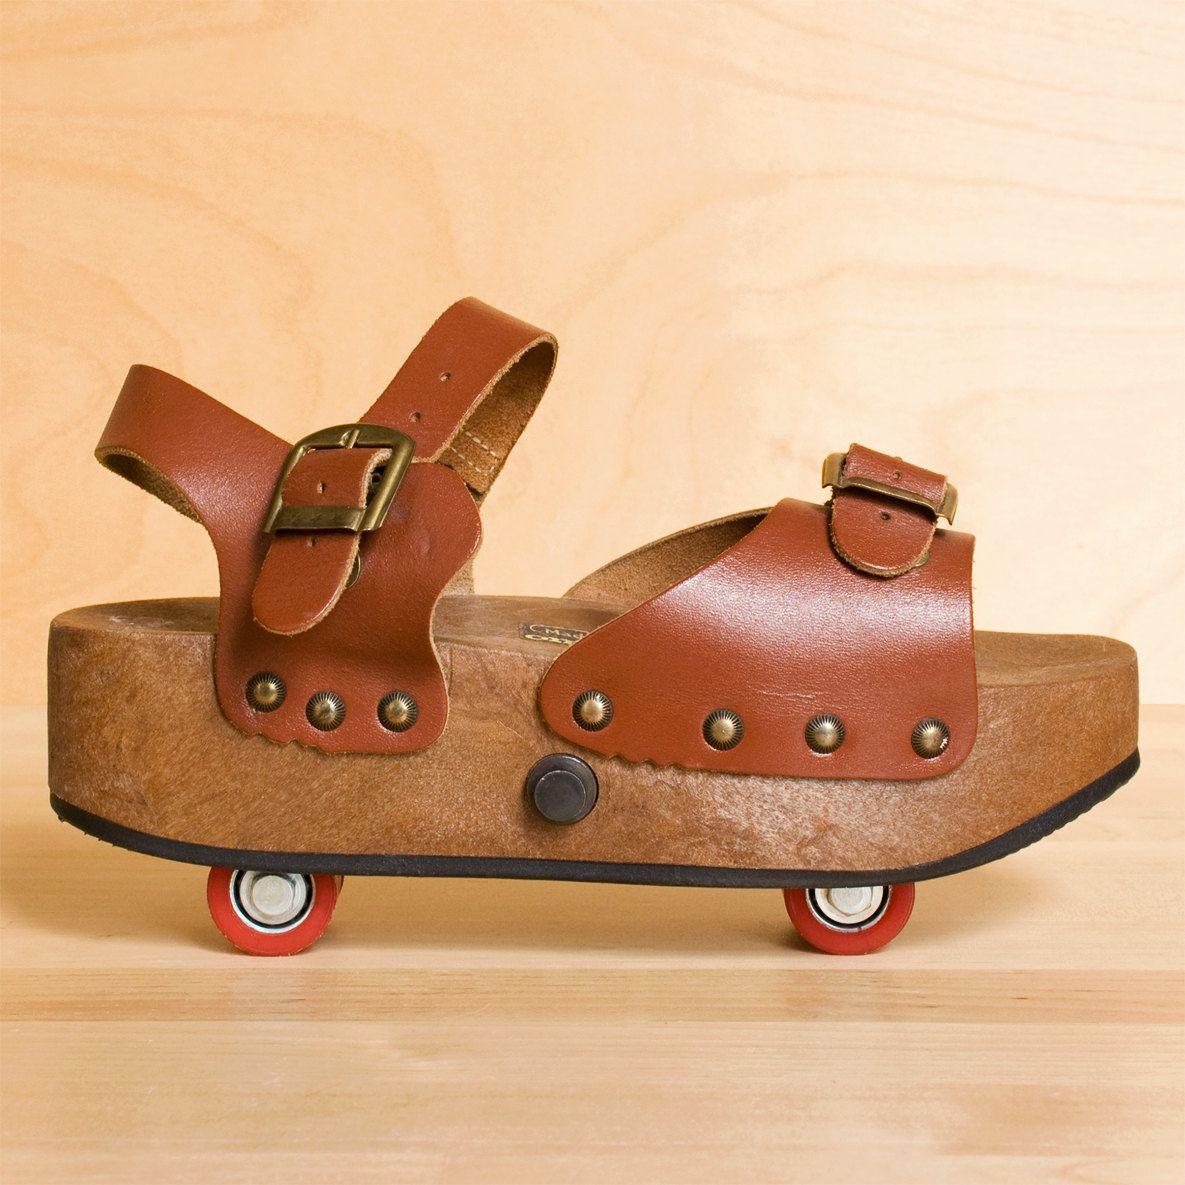 Pop out roller skate shoes - Pop Out Roller Skate Shoes 58